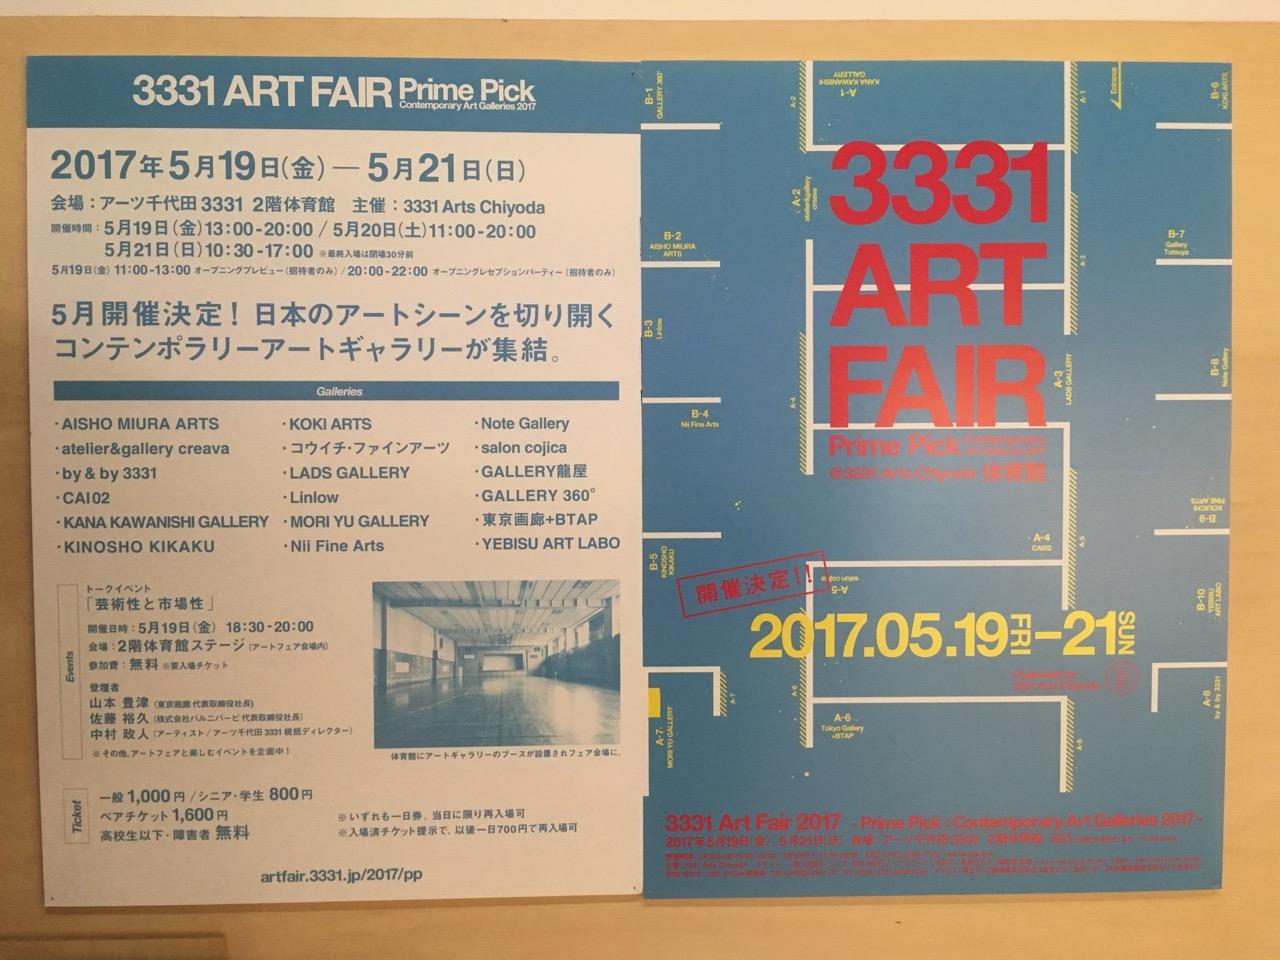 f:id:tetsuya0723:20170322164524j:plain